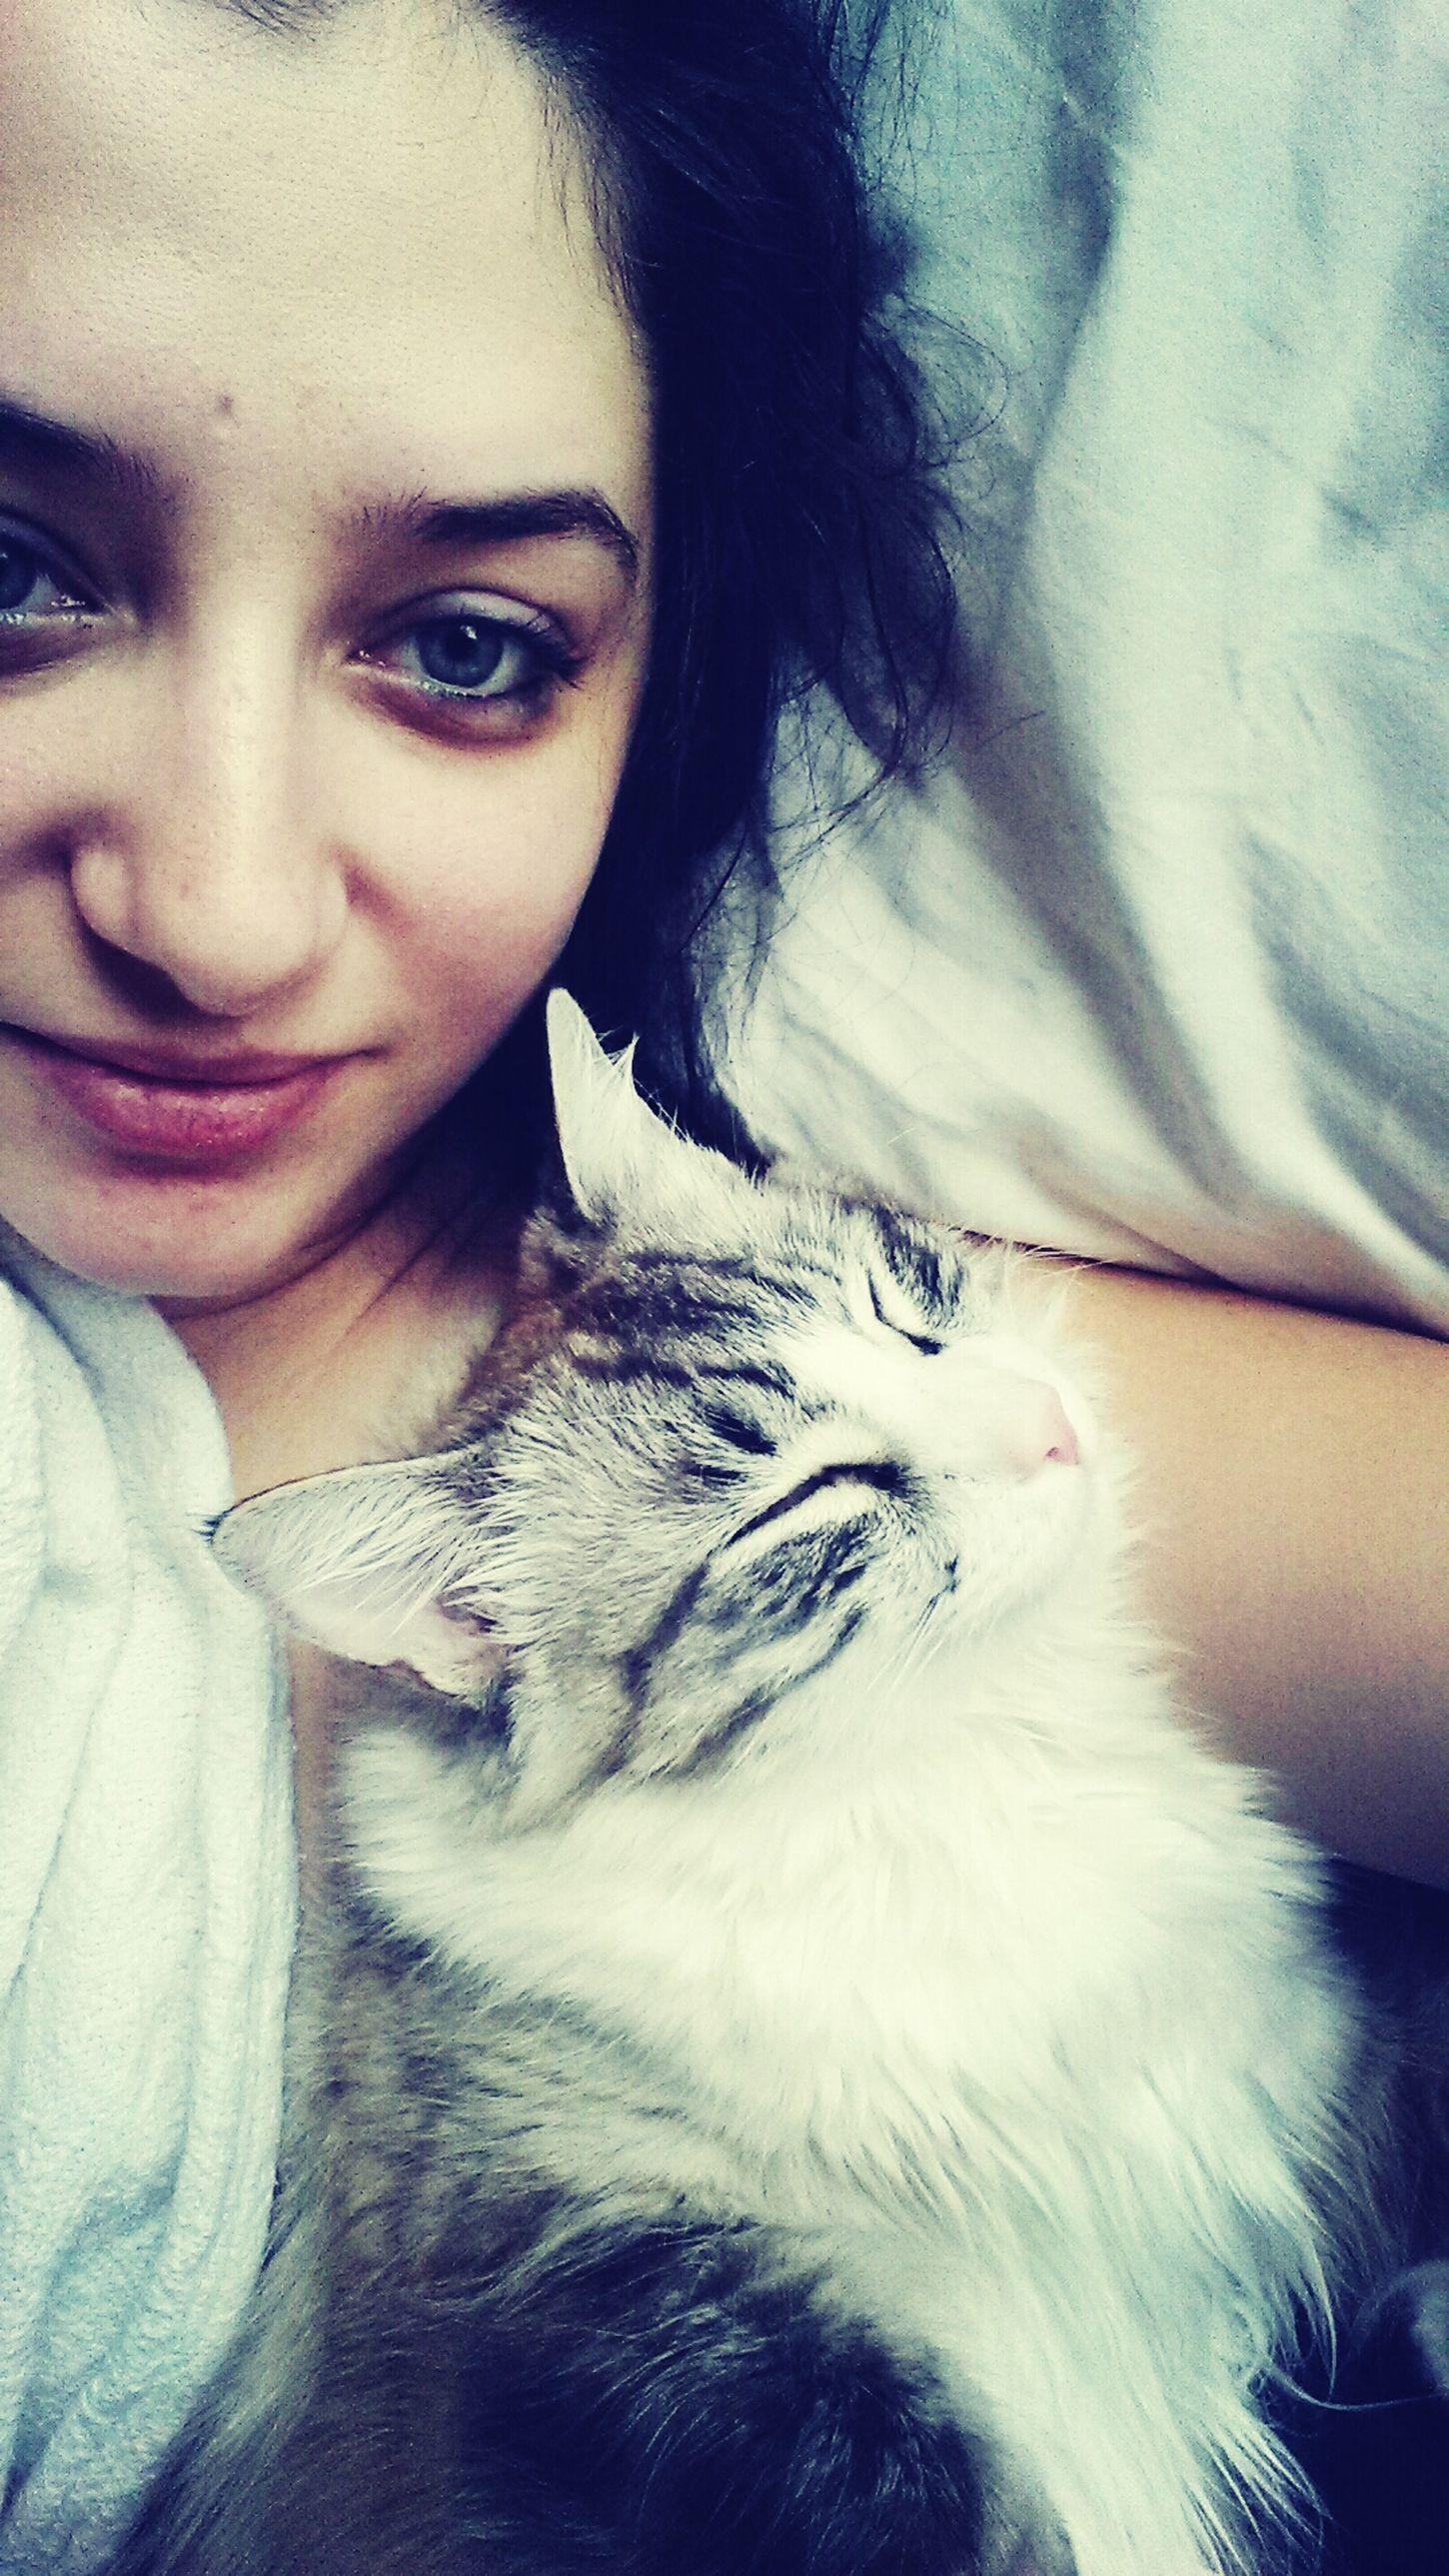 Sleepy Cat Saturday Morning Siamese Dreams My Feline Friends